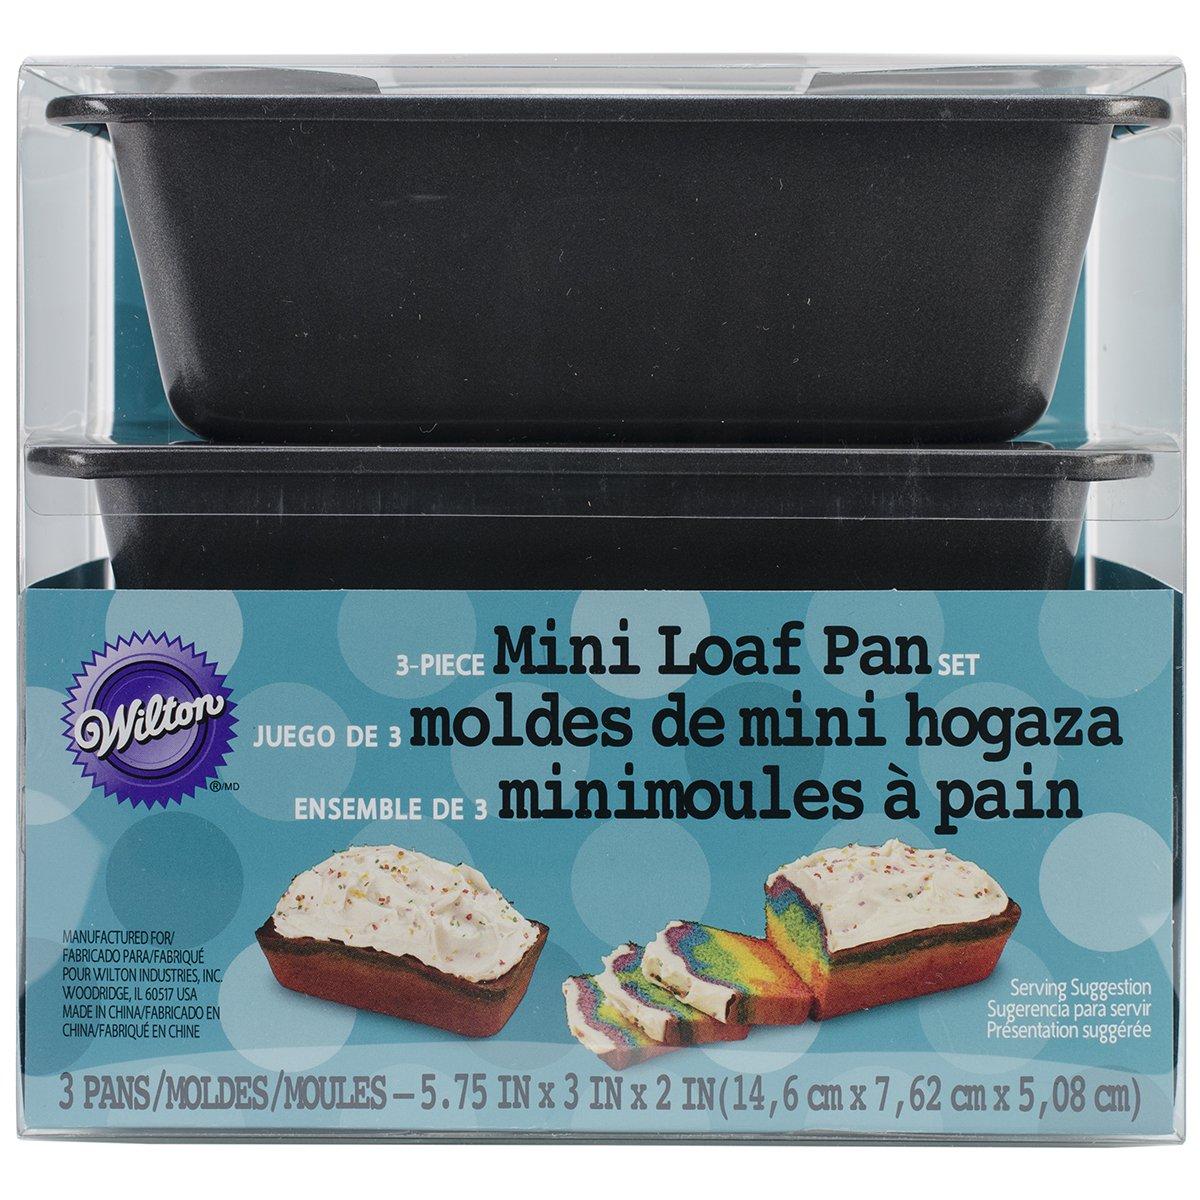 Wilton Non-Stick Mini Loaf Pan Set, 3-Piece product image